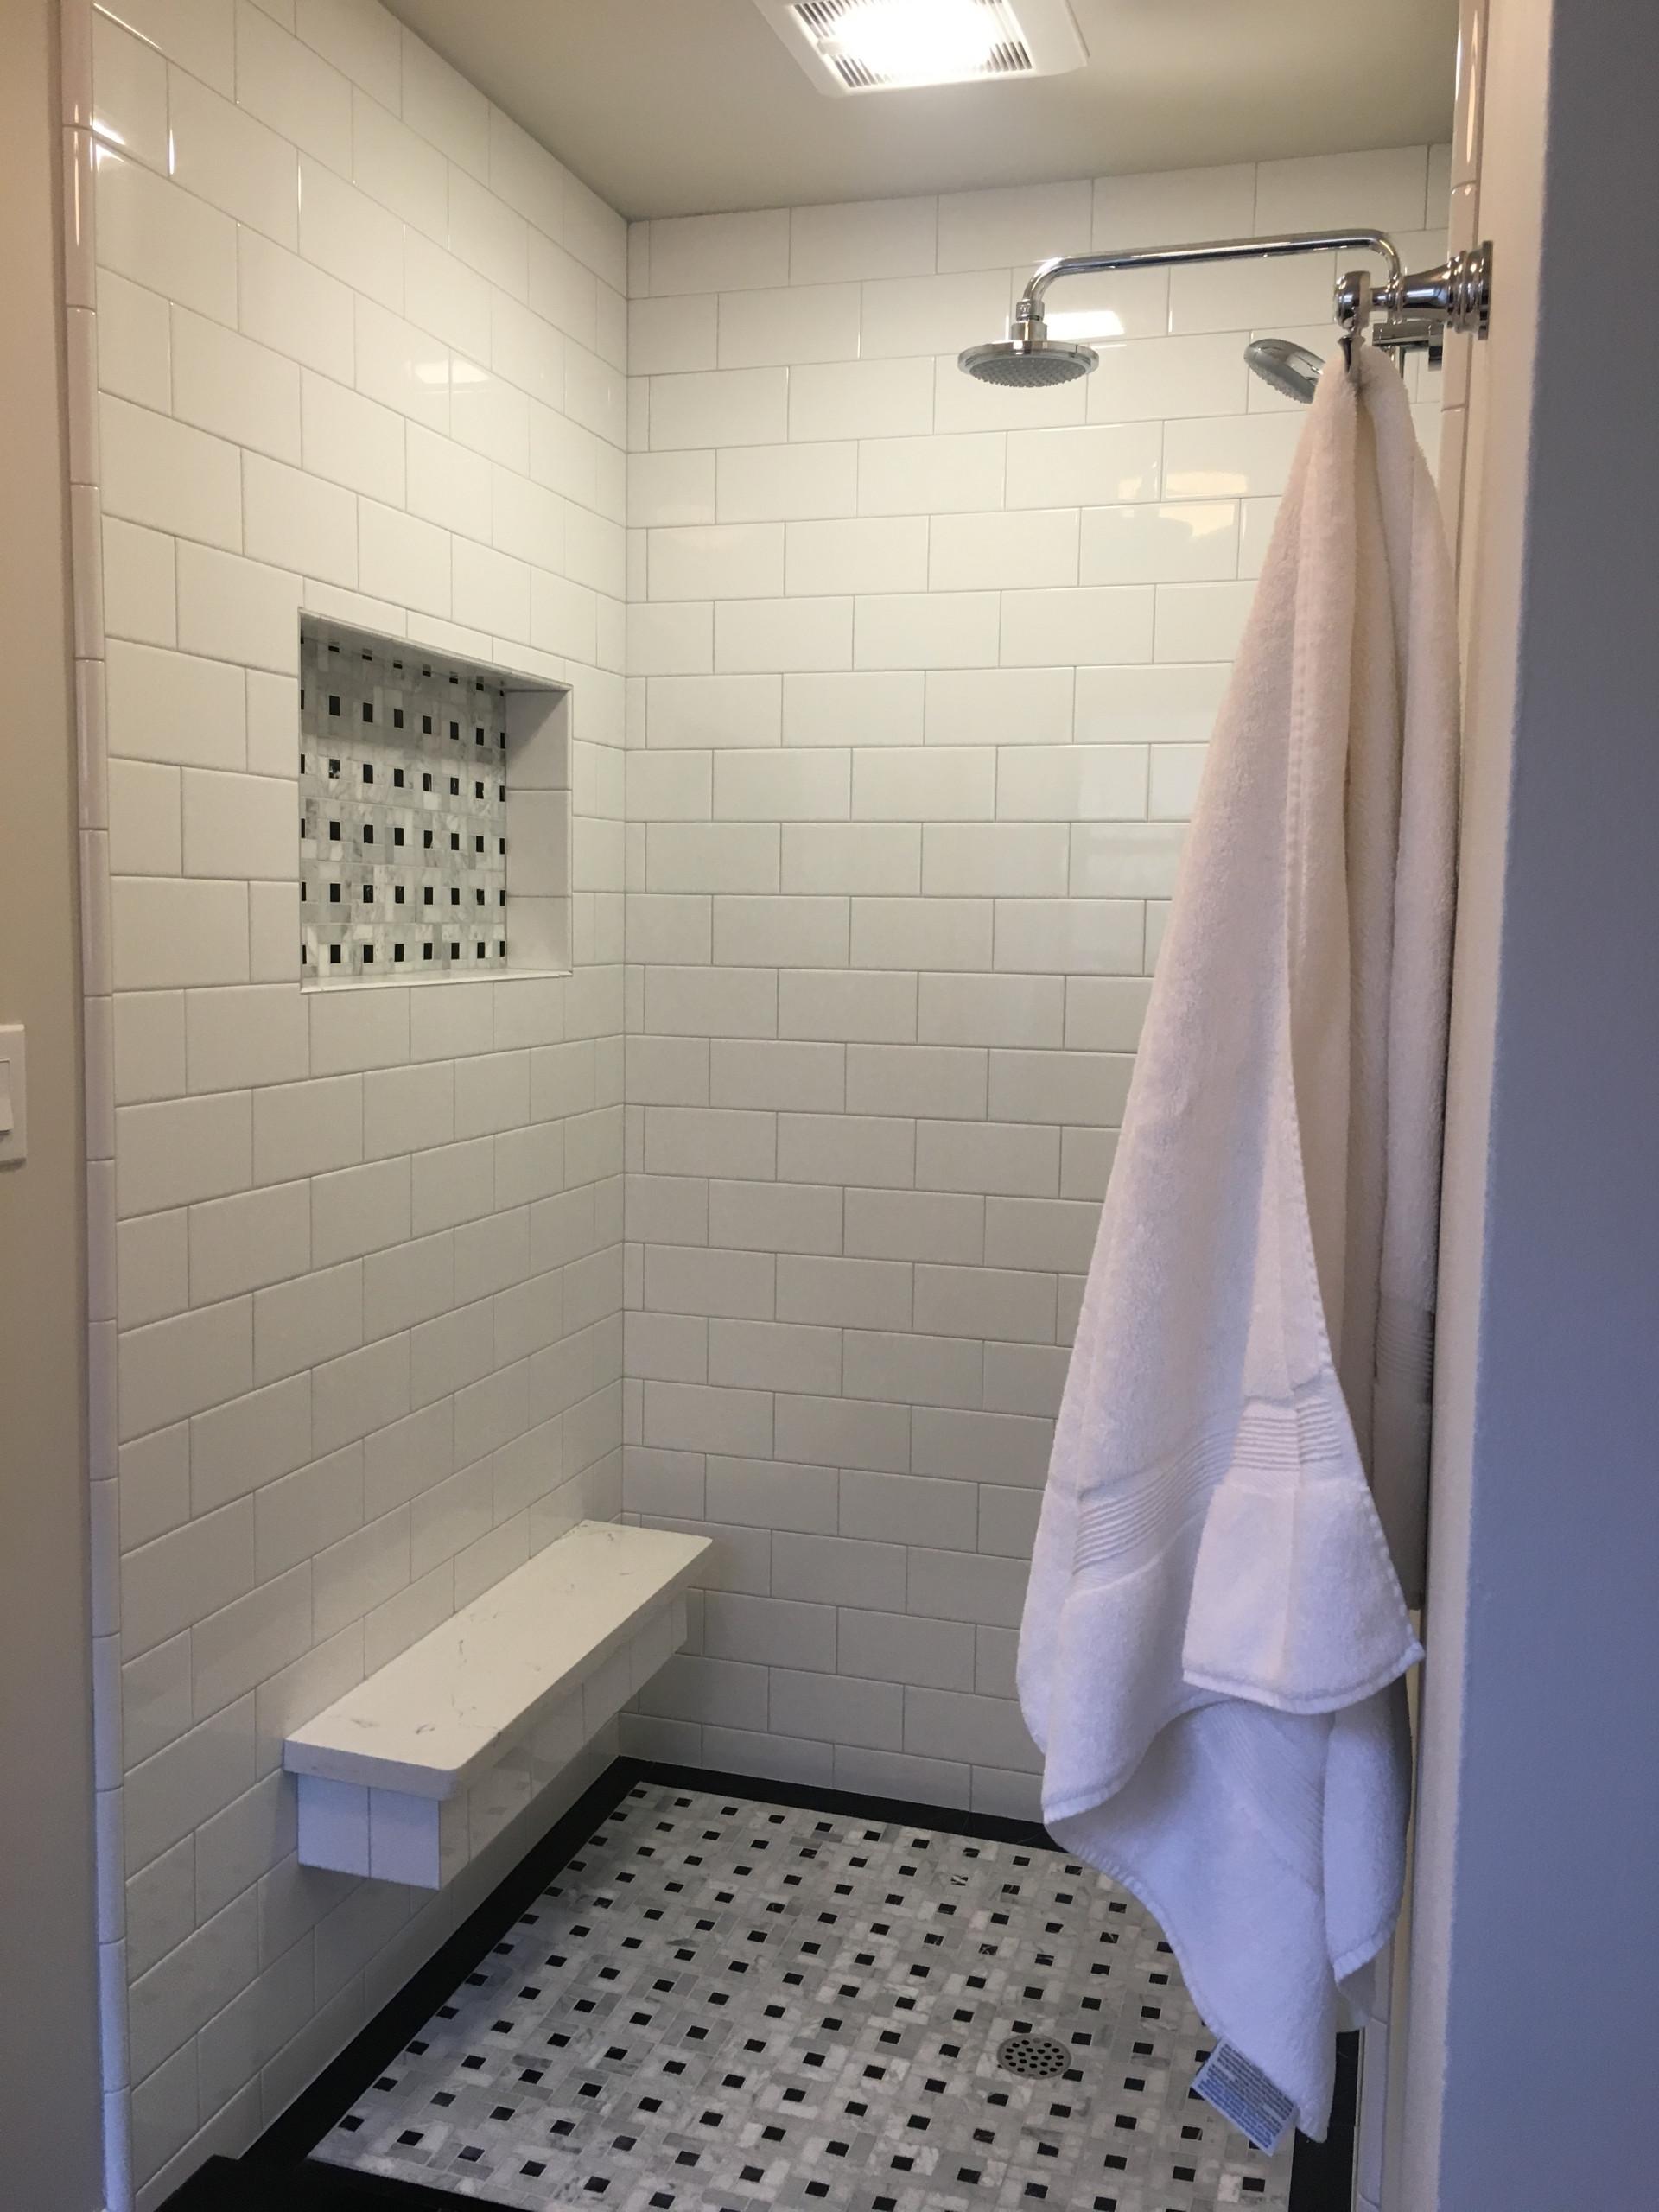 Retro Black and White Marble Bathroom